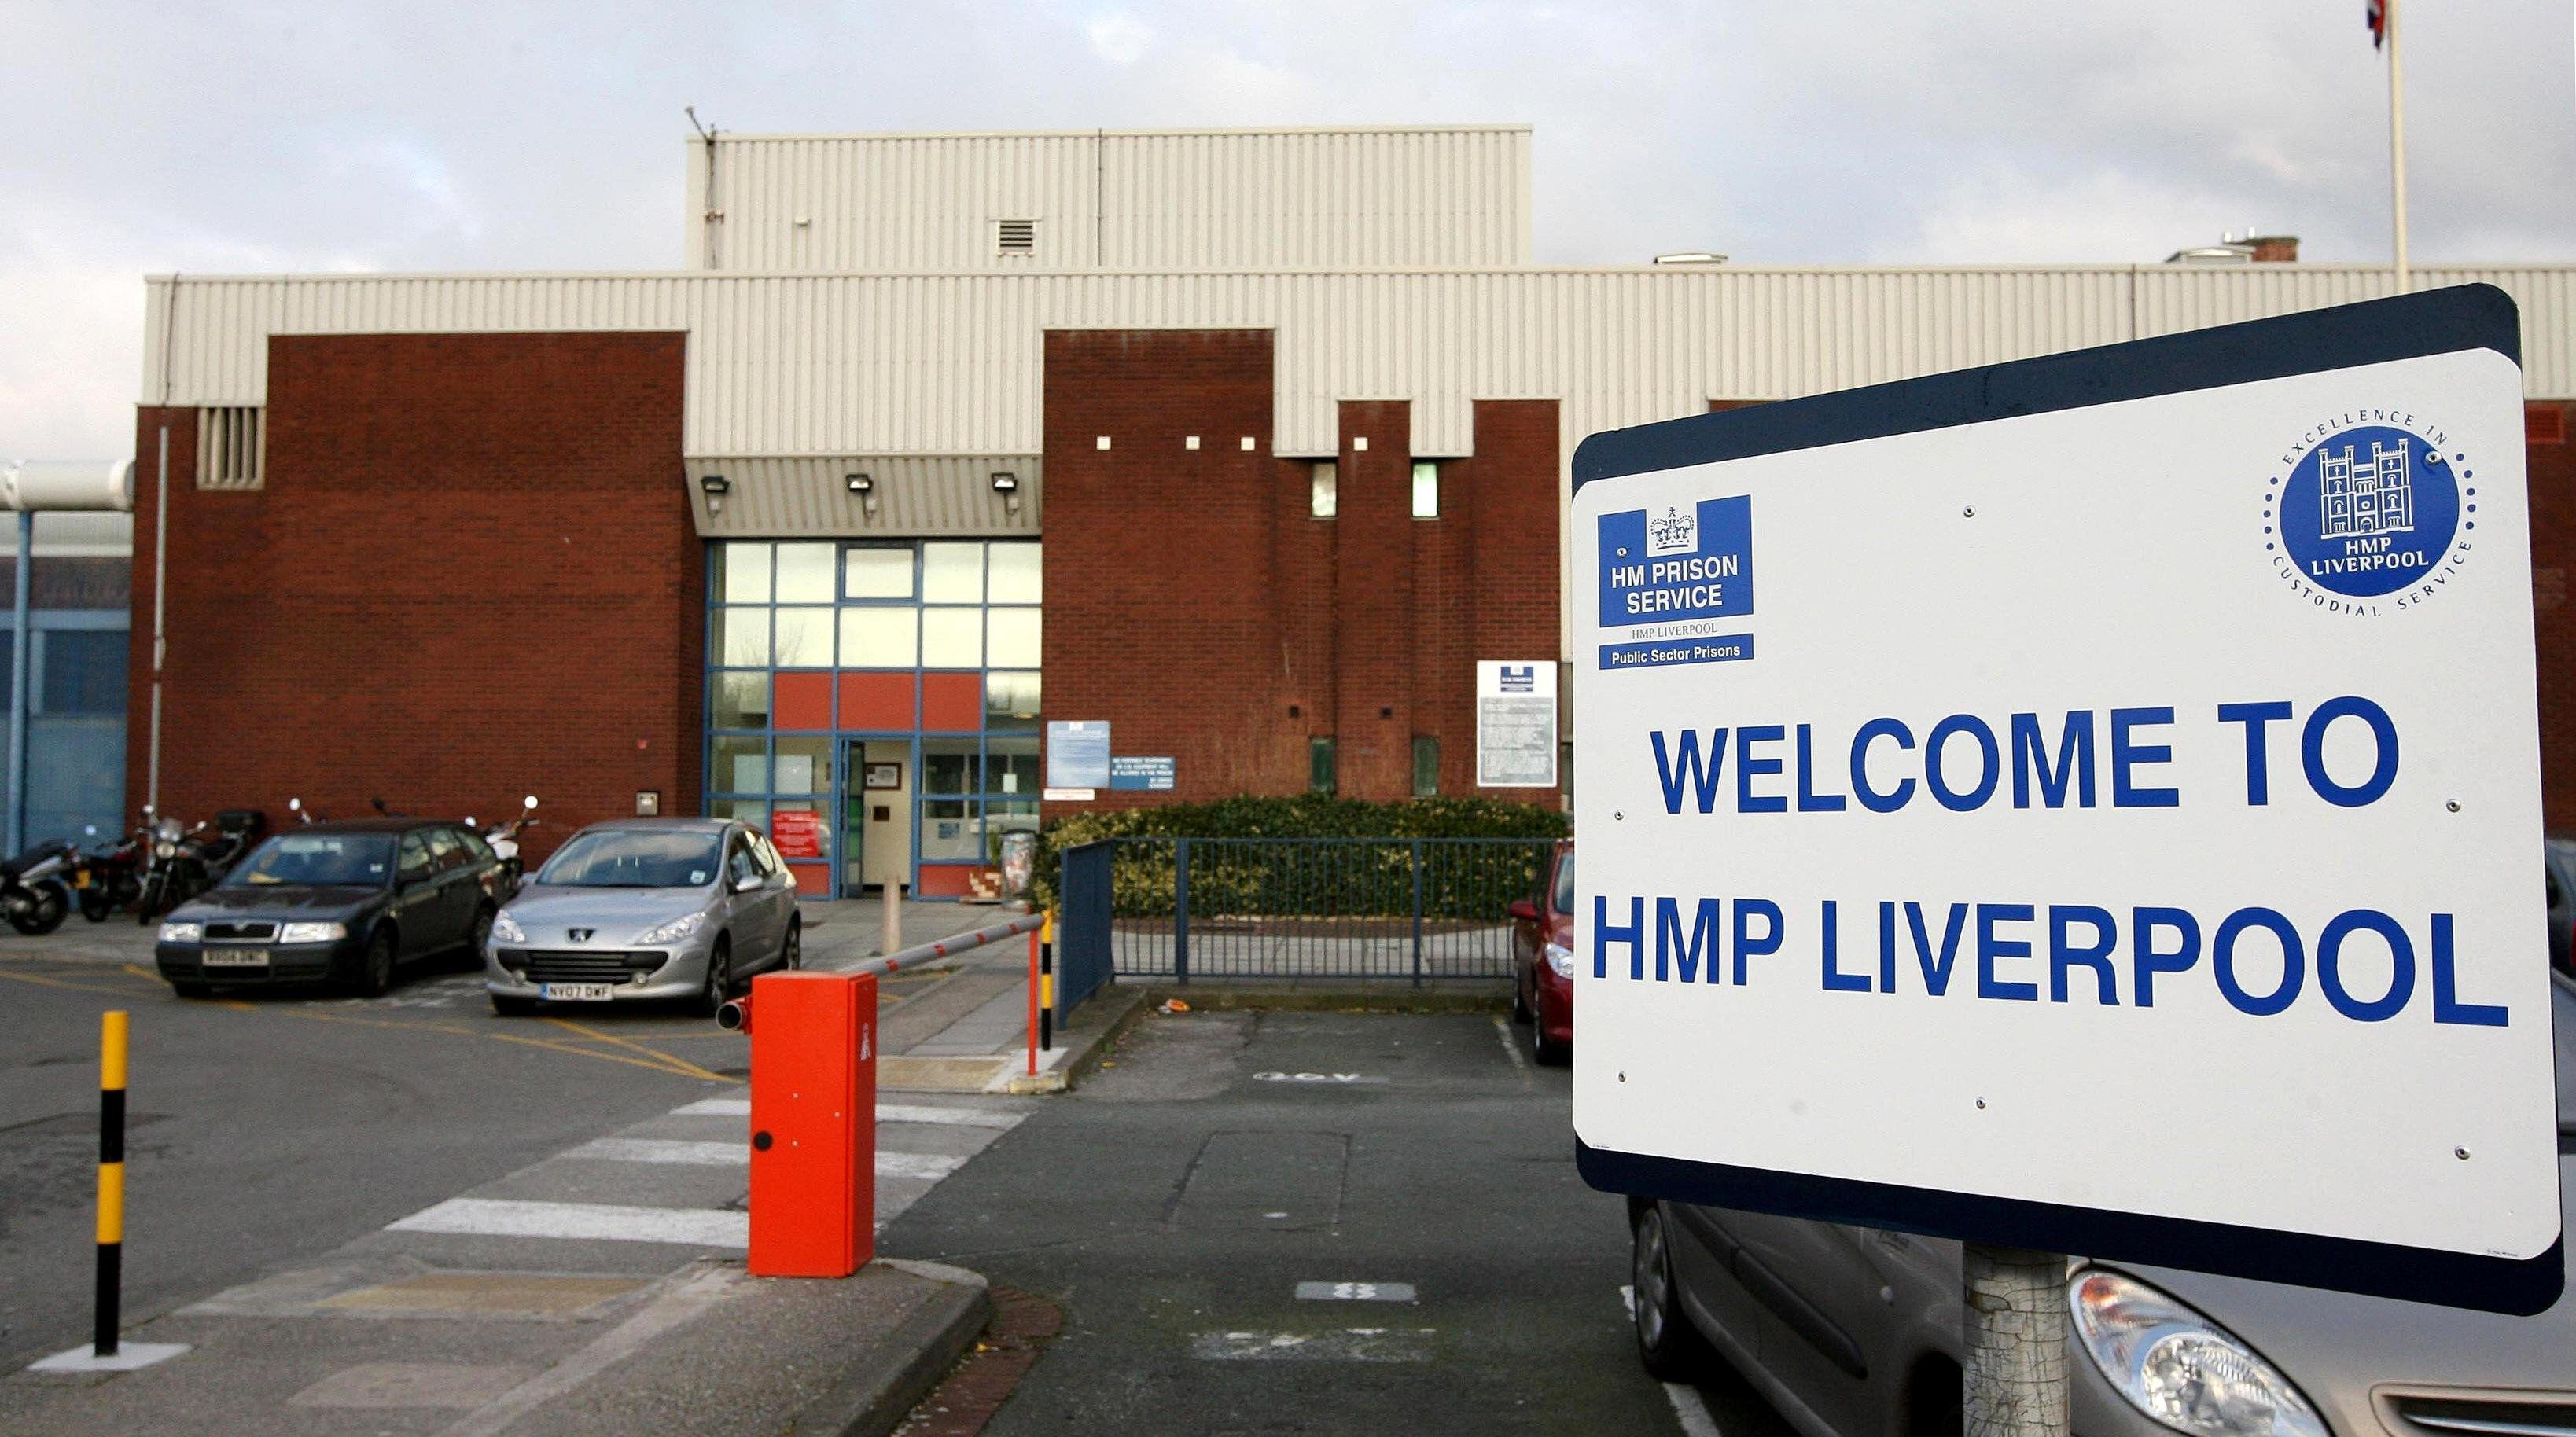 Dutch court refuses to extradite prisoner to Liverpool ...